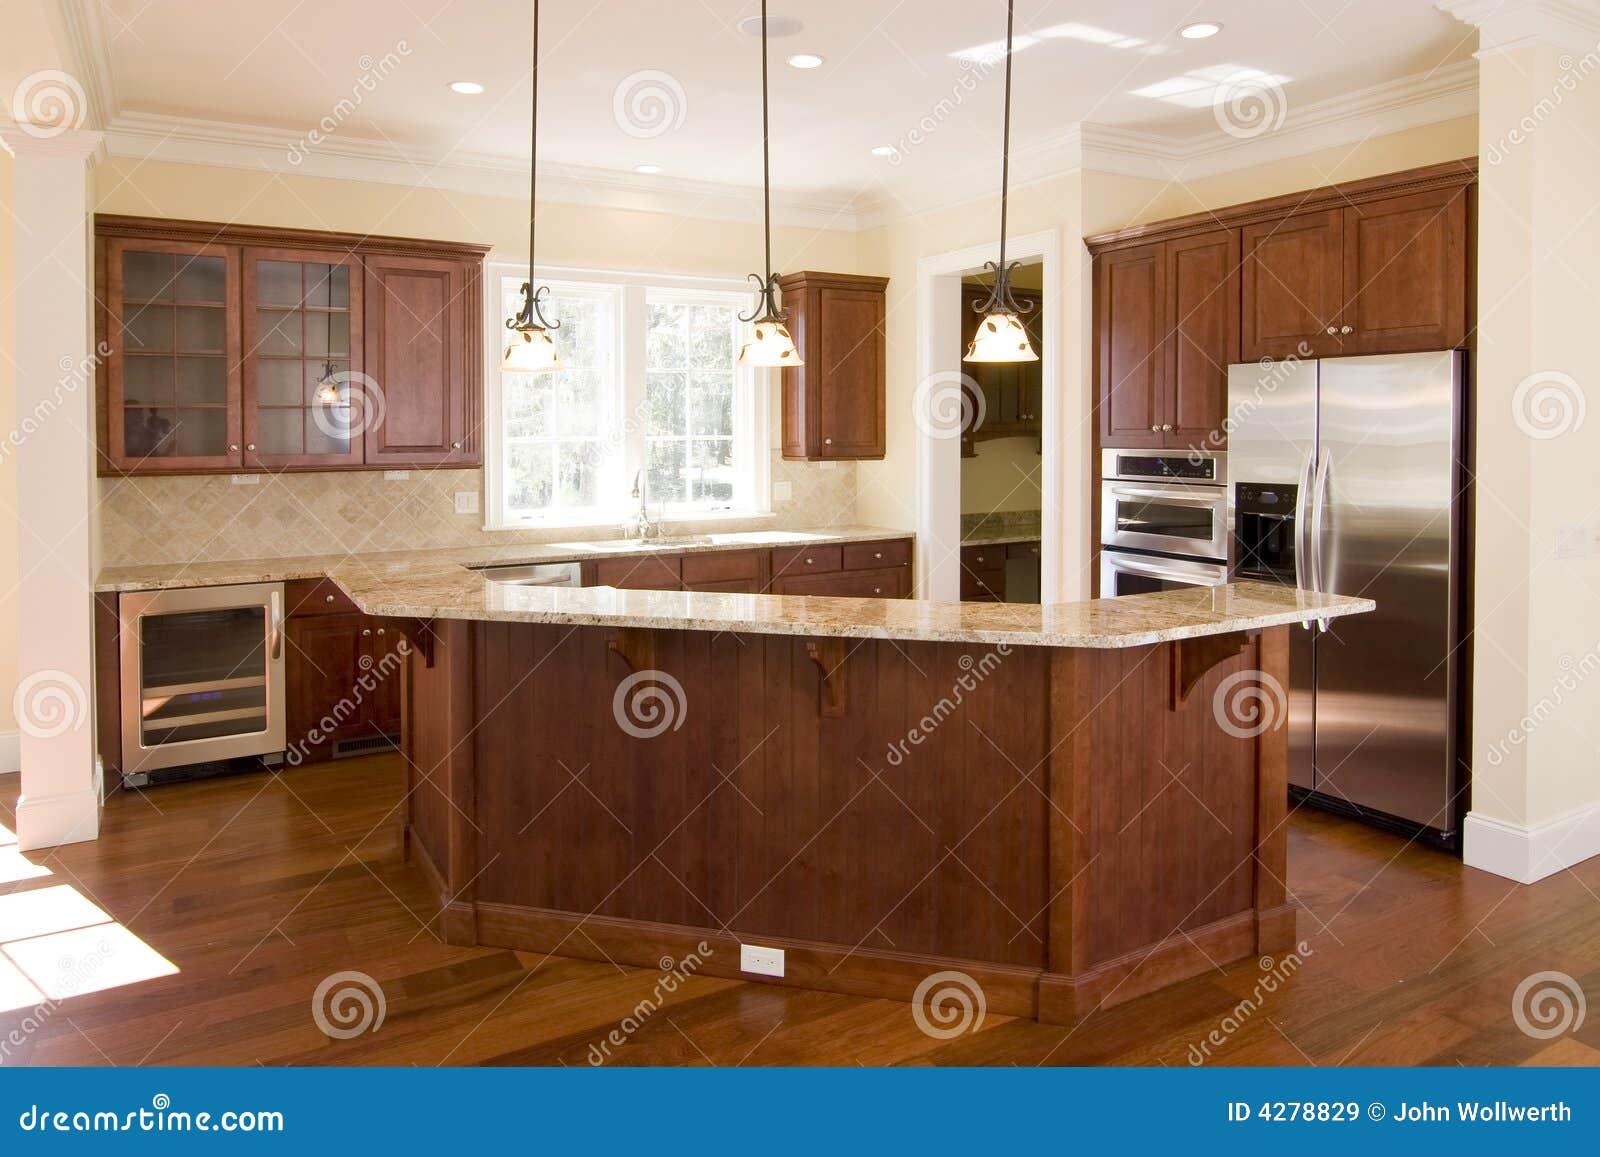 Großzügig Dunklem Holz Küchenschränke Bilder Galerie - Küche Set ...